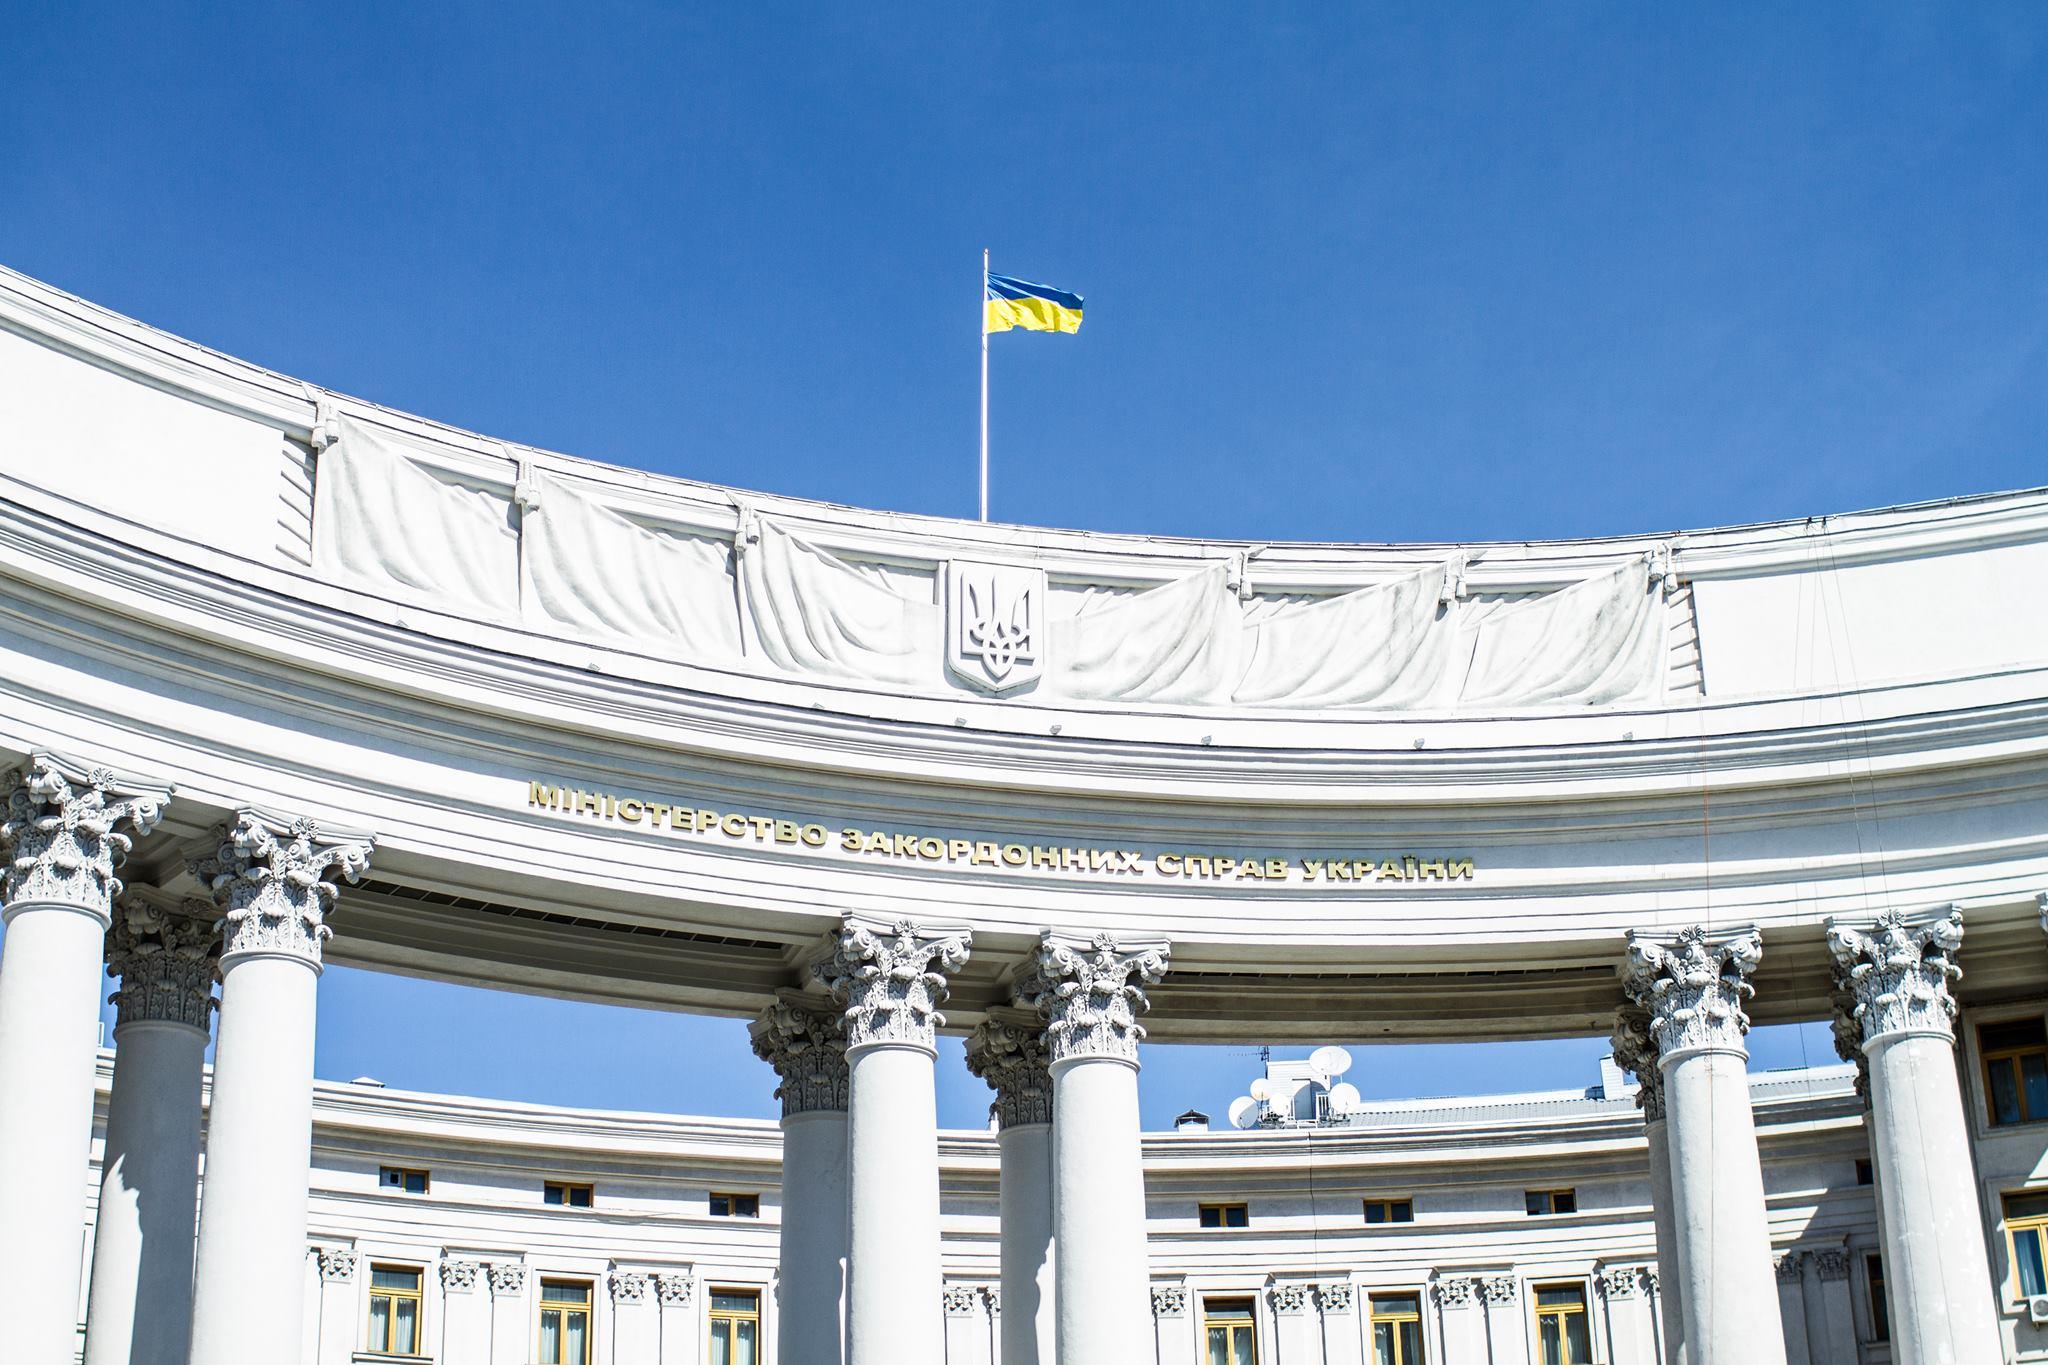 MFA Ukraine #новости Абхазия, Грузия-Россия, Грузия-Украина, украина